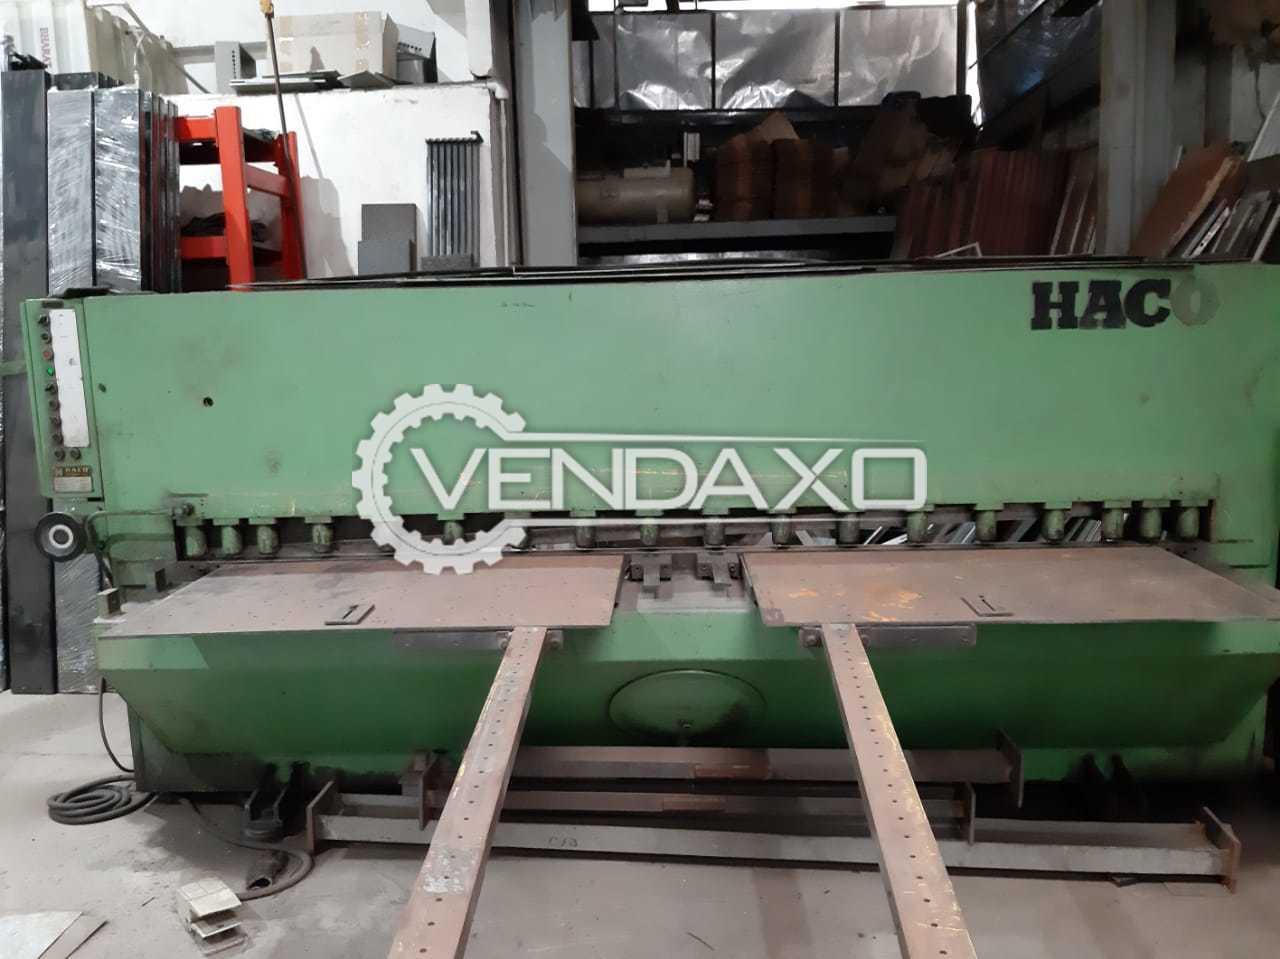 Haco Hydraulic Pkte Shearing Machine - 3000 x 6 mm